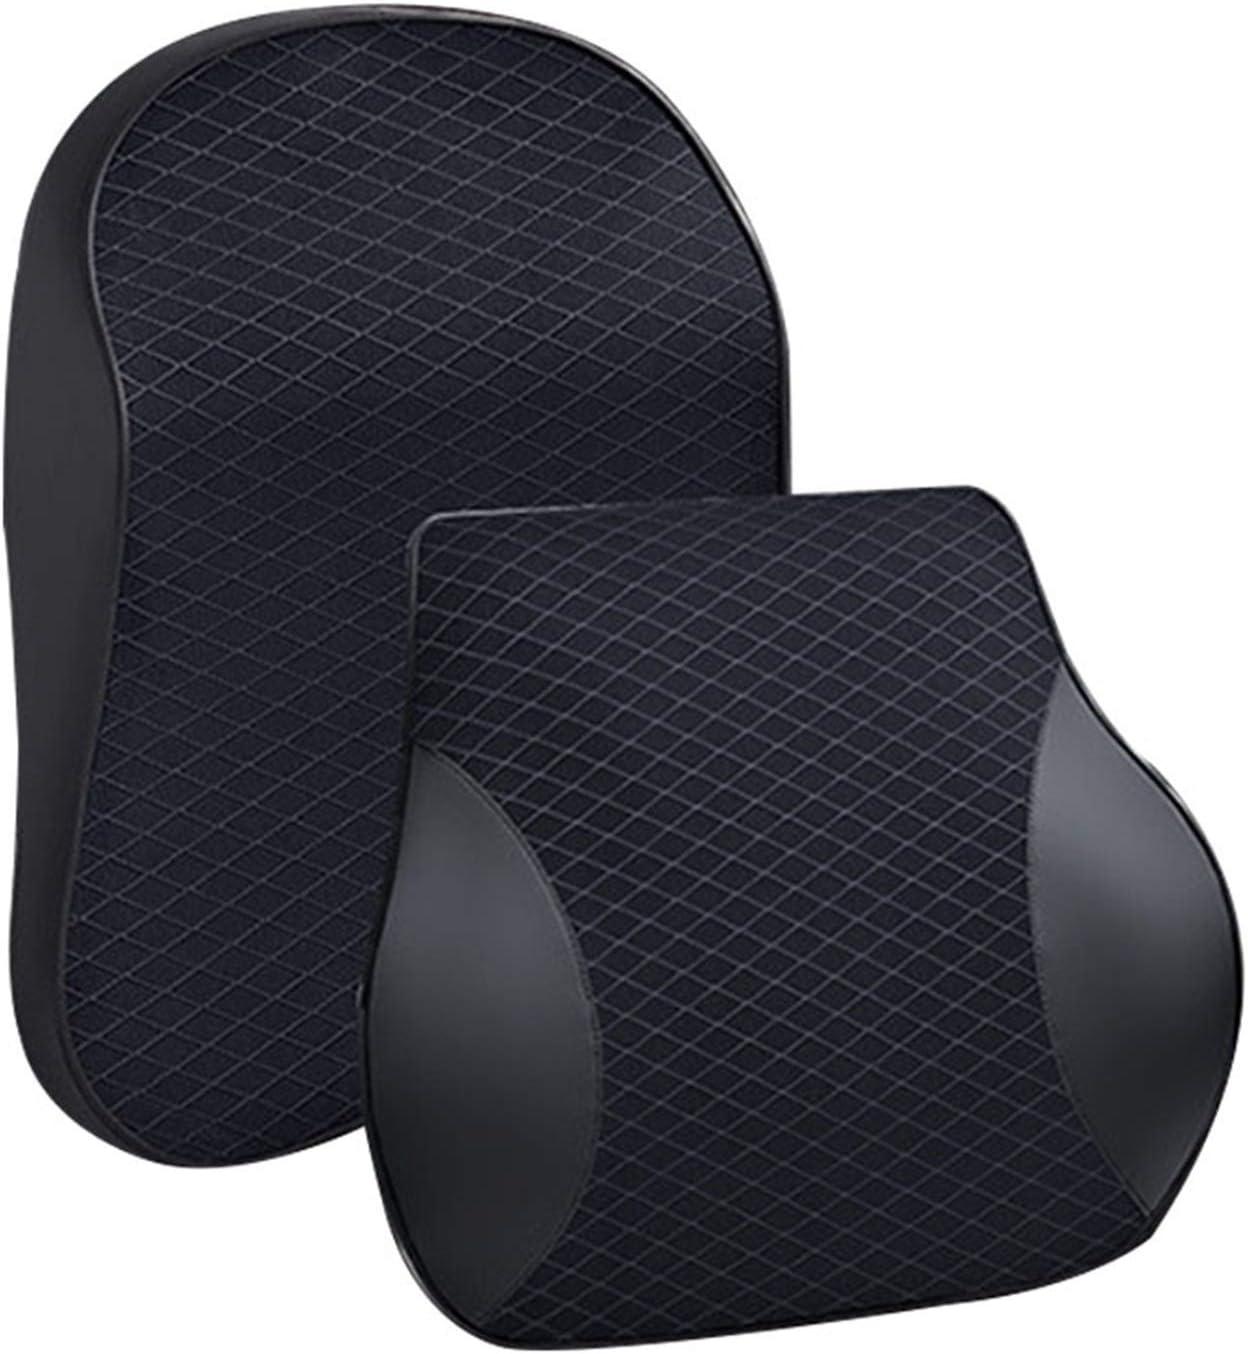 Xiaolili New life 3D Memory Foam Car Rare Neck Pillow Wa Leather PU